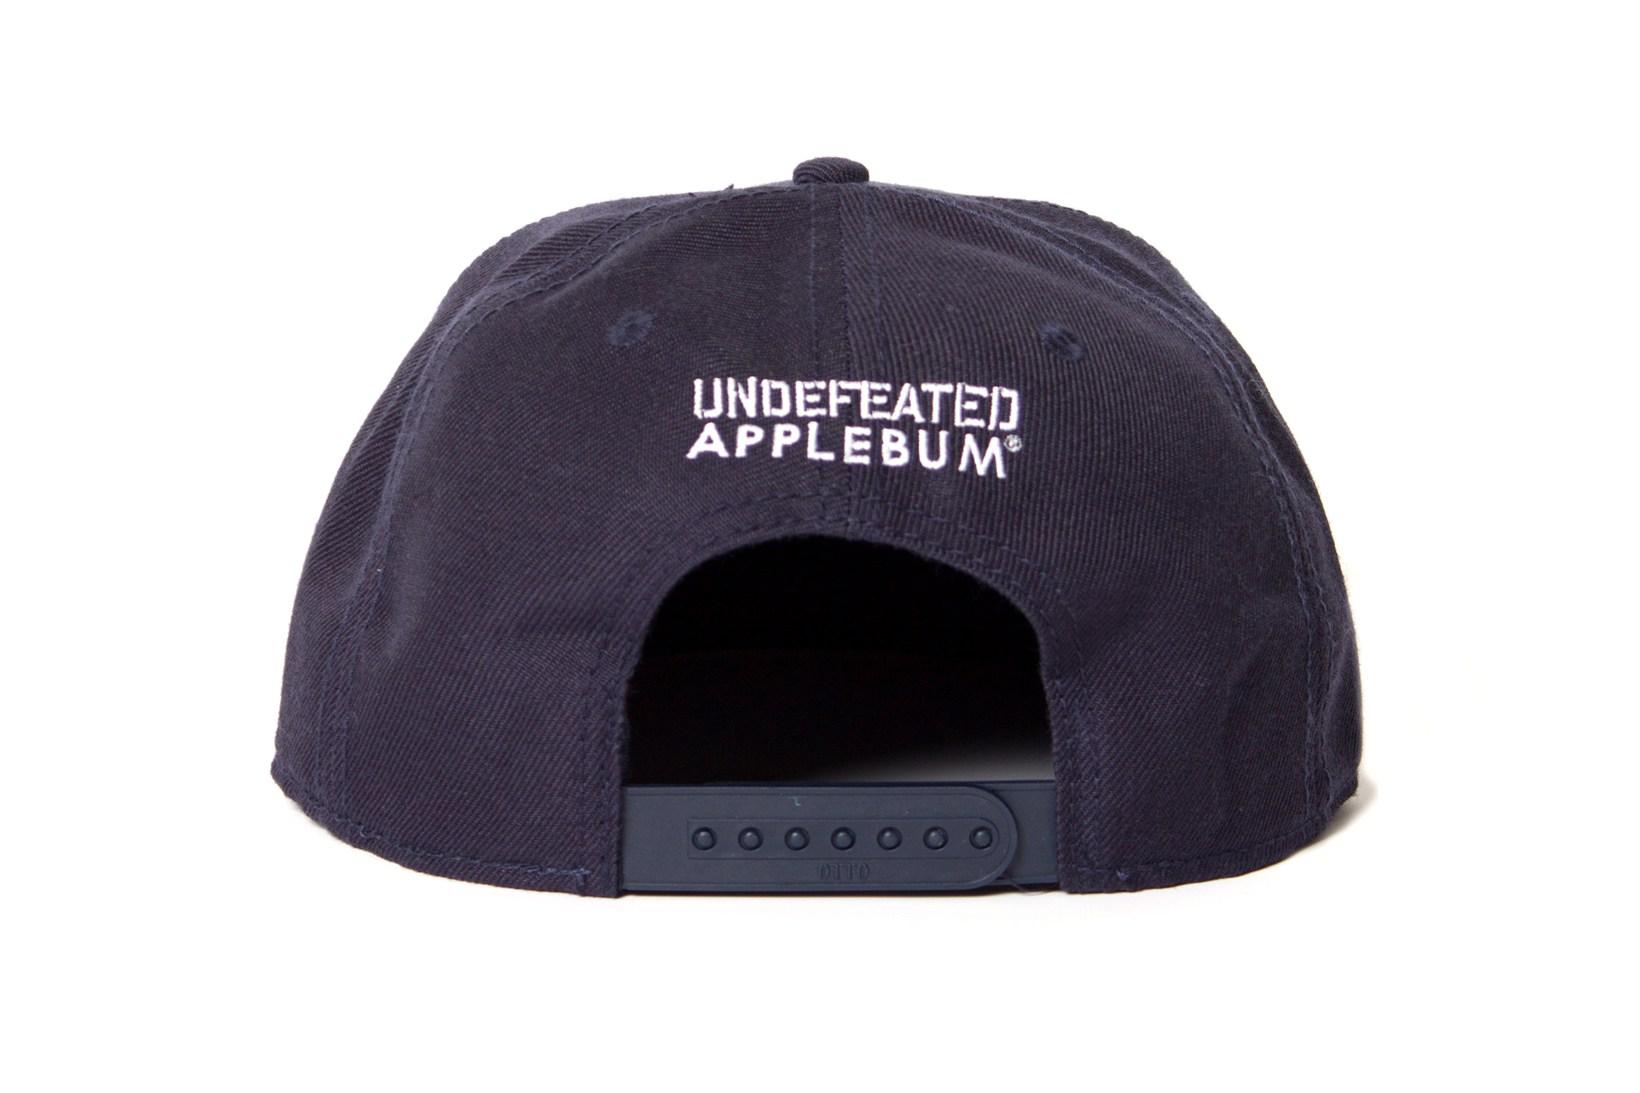 undefeated-applebum-2016-08